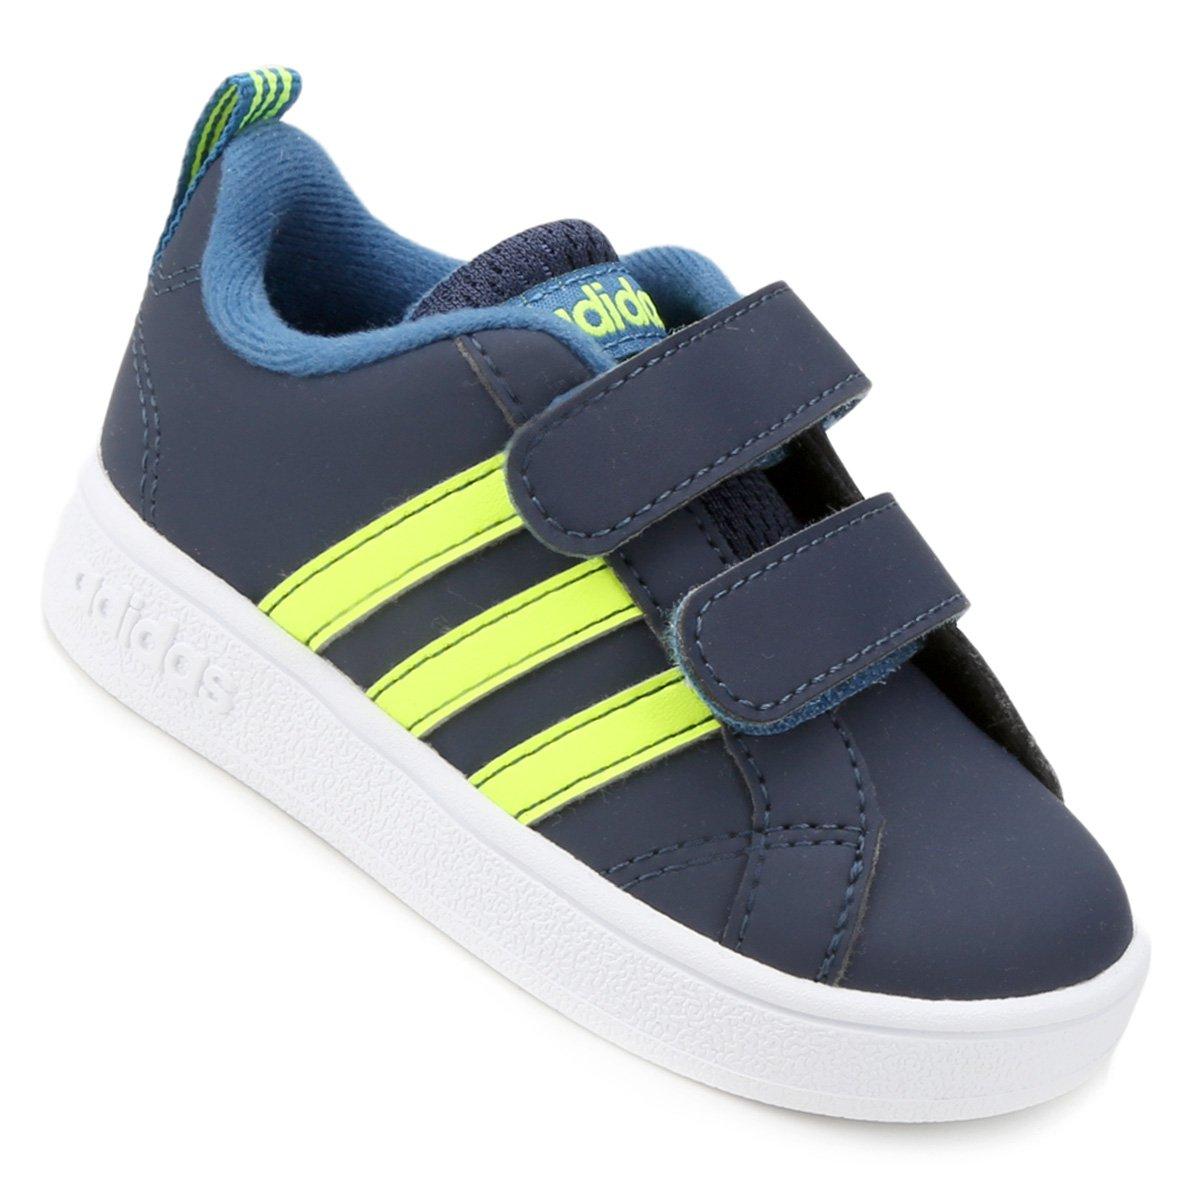 4efbc7104e8 Tênis Infantil Adidas Vs Advantage Cmf